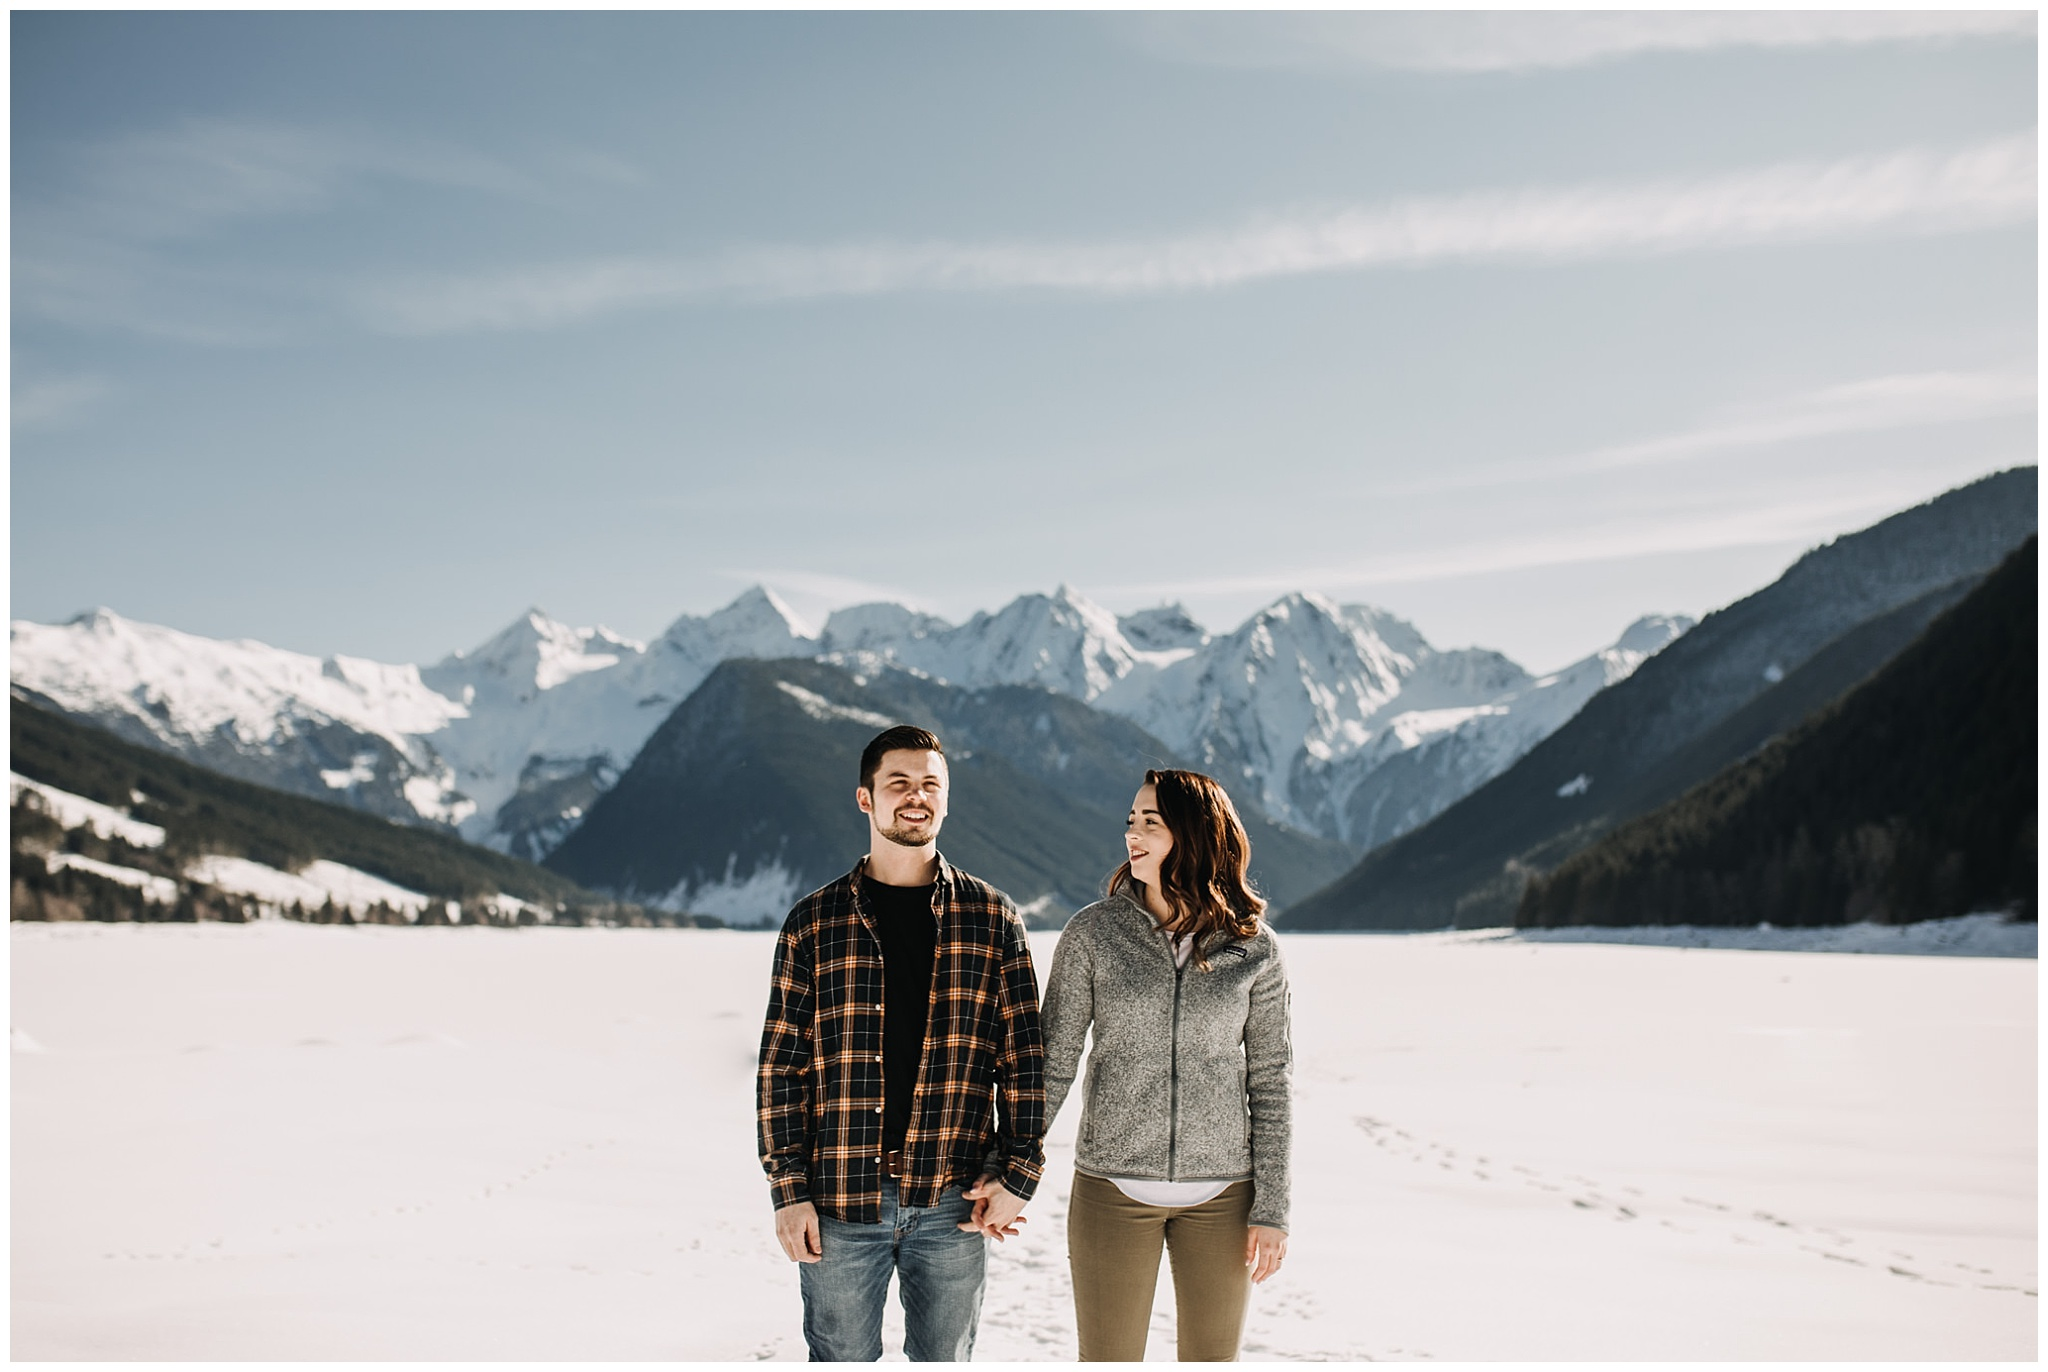 couple engagement session at jones lake chilliwack bc snow mountains